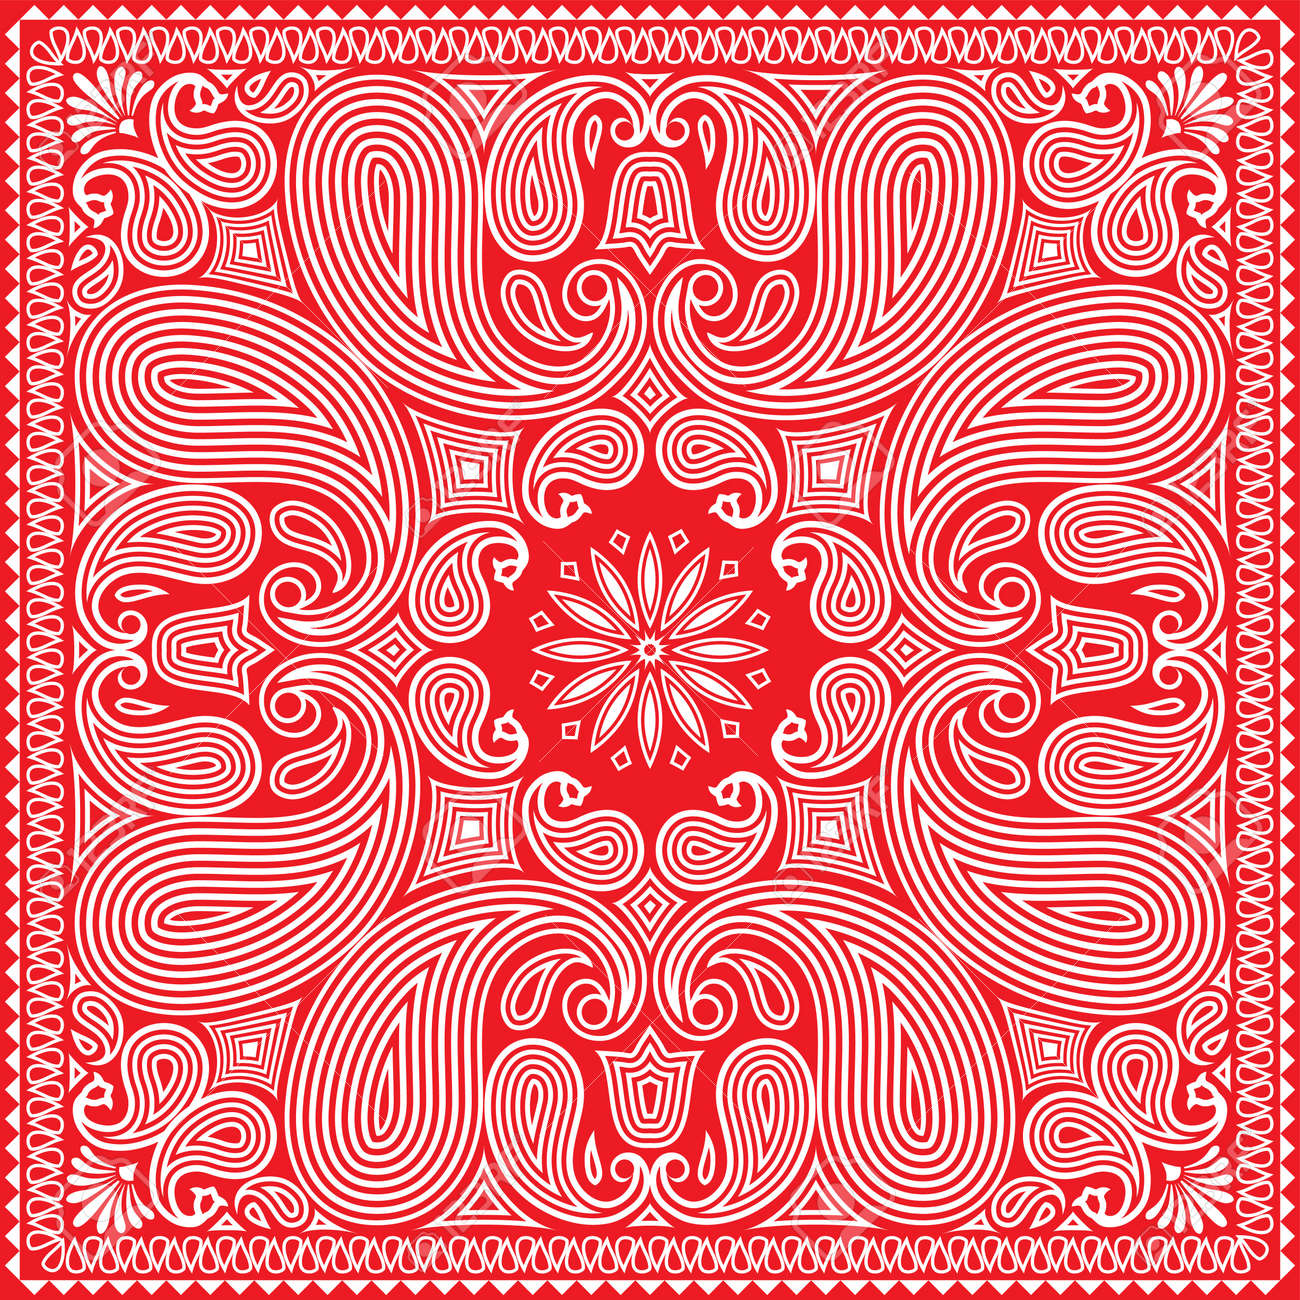 Red Bandana Design Stock Vector - 10360267